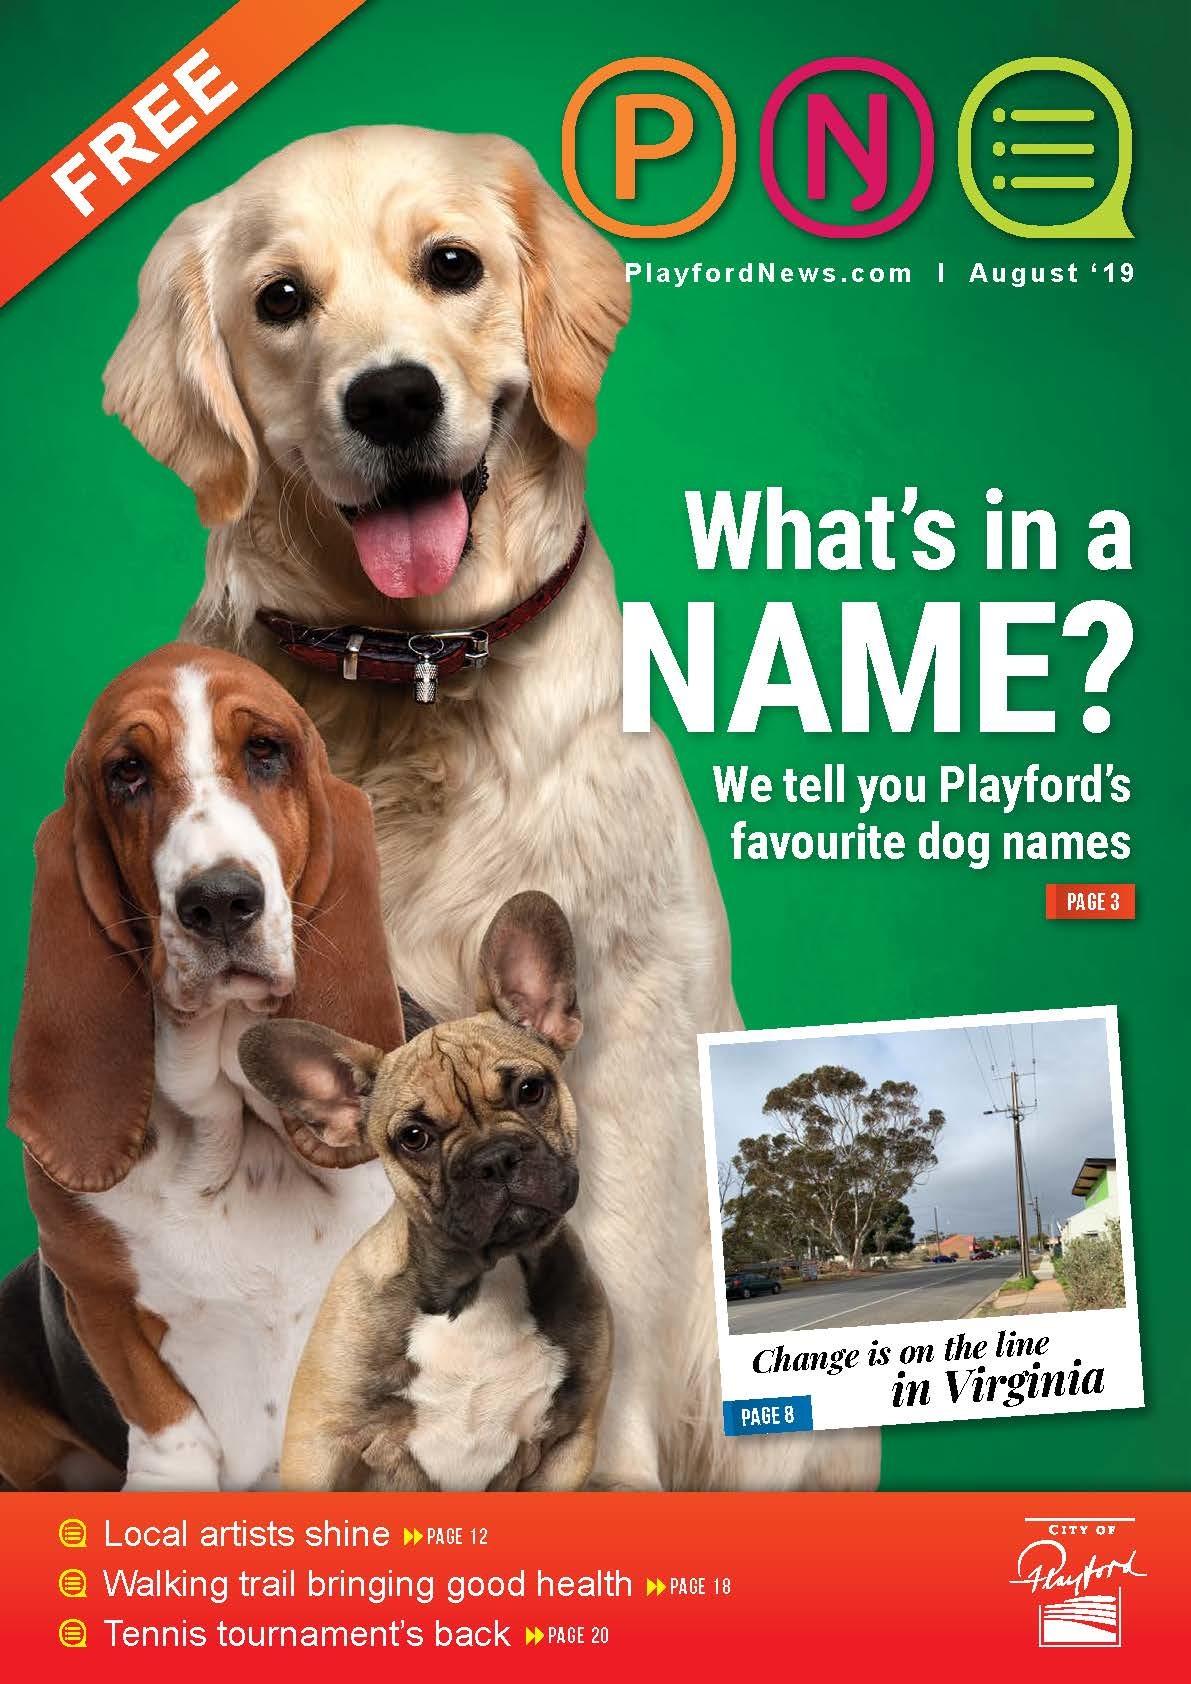 Playford News Spring 2019